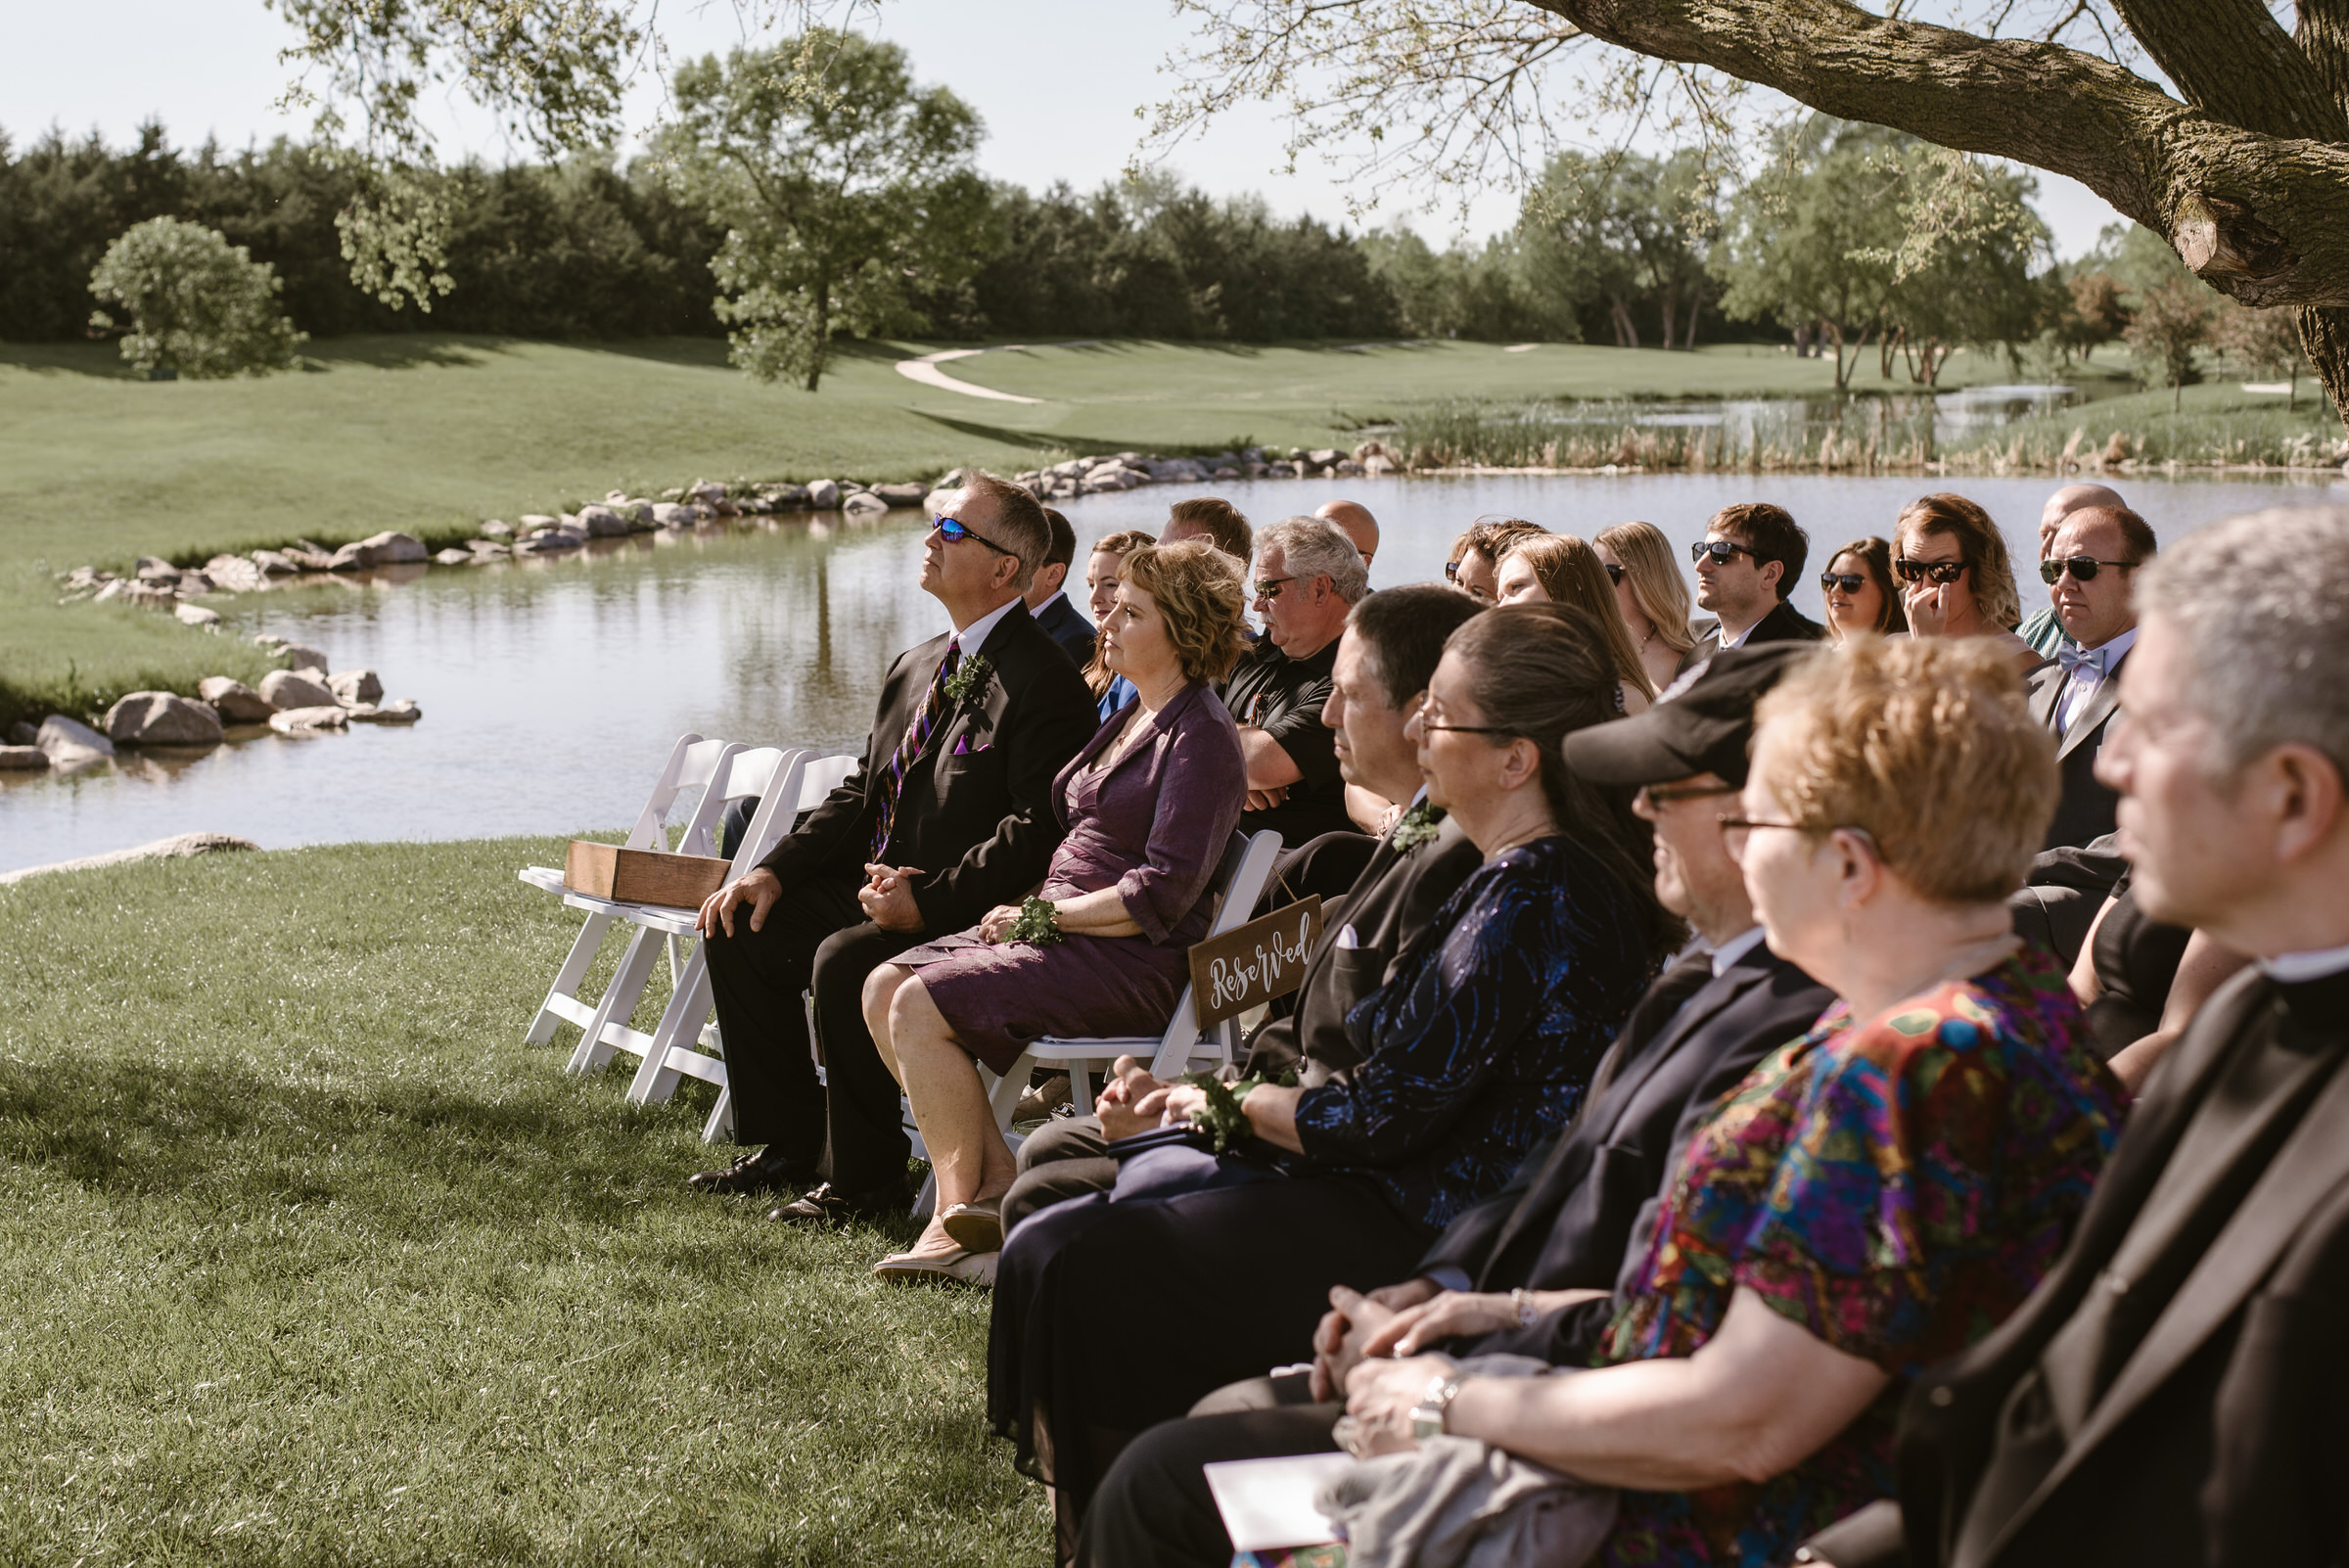 Wilderness-Ridge-Lincoln-Nebraska-Wedding-Kaylie-Sirek-Photography-058.jpg